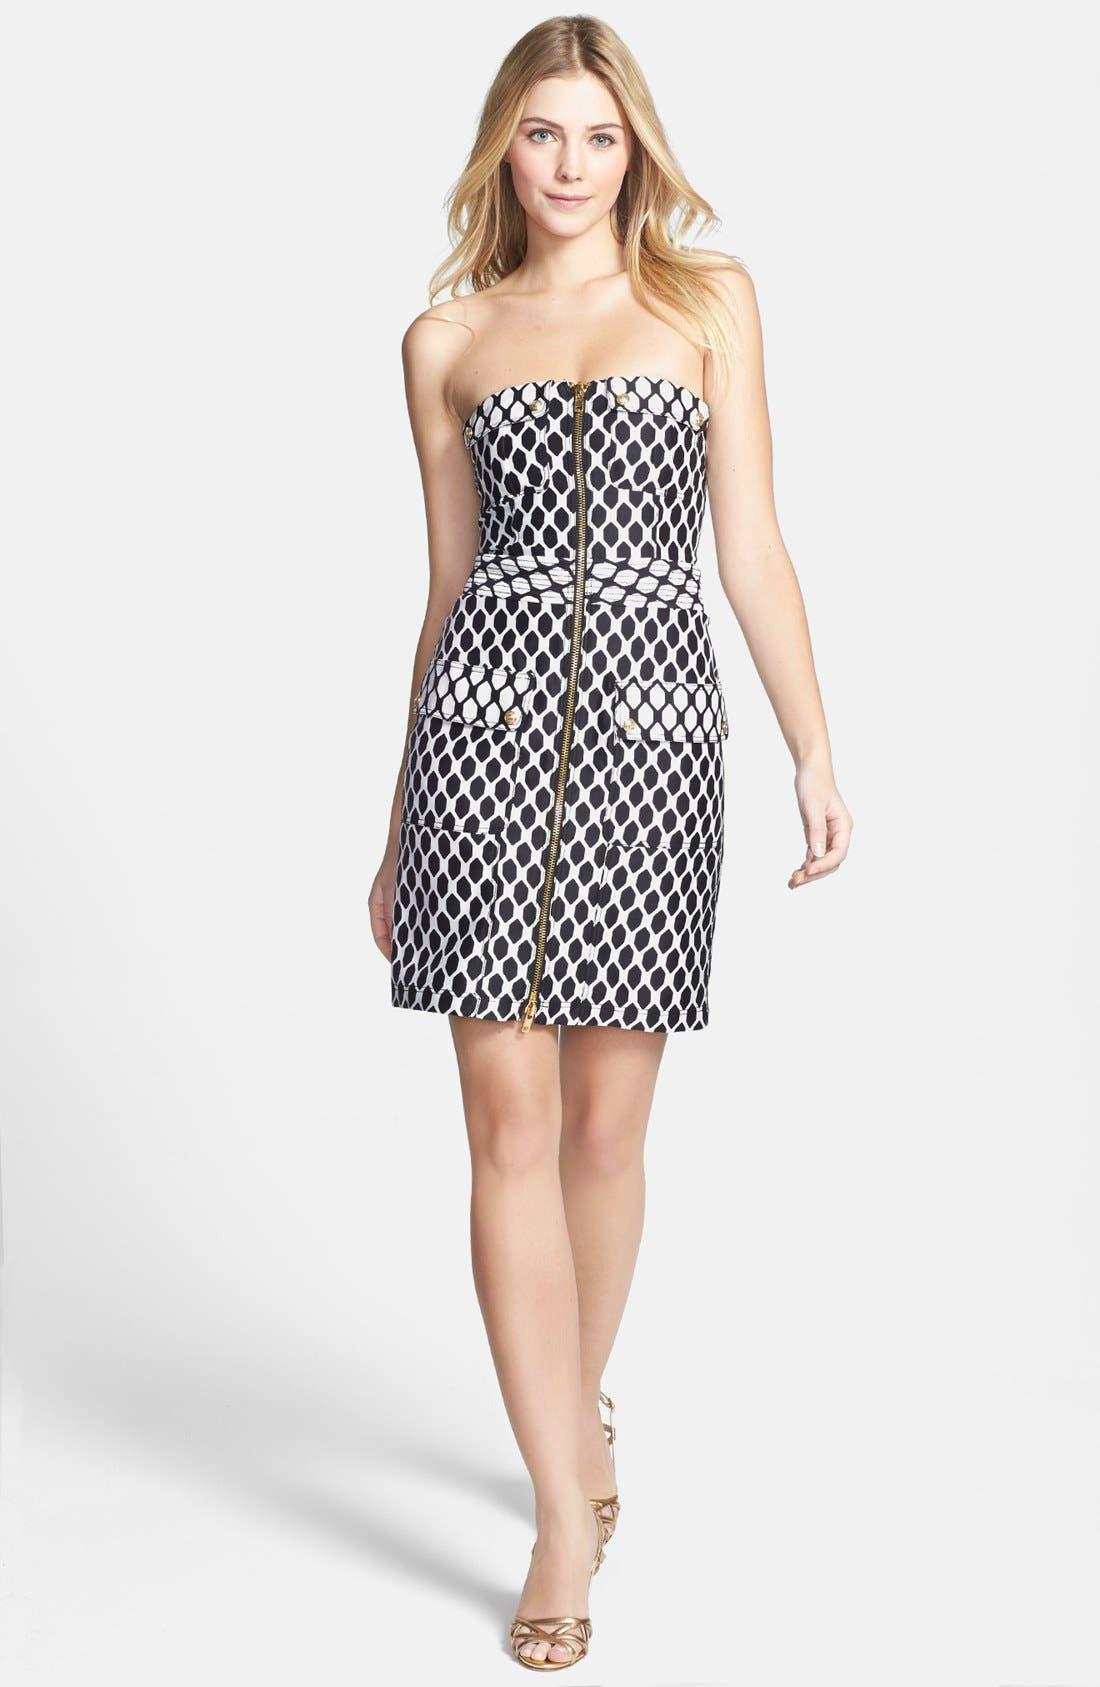 Alternate Image 1 Selected - Diane von Furstenberg 'Adida' Wool & Silk Sheath Dress